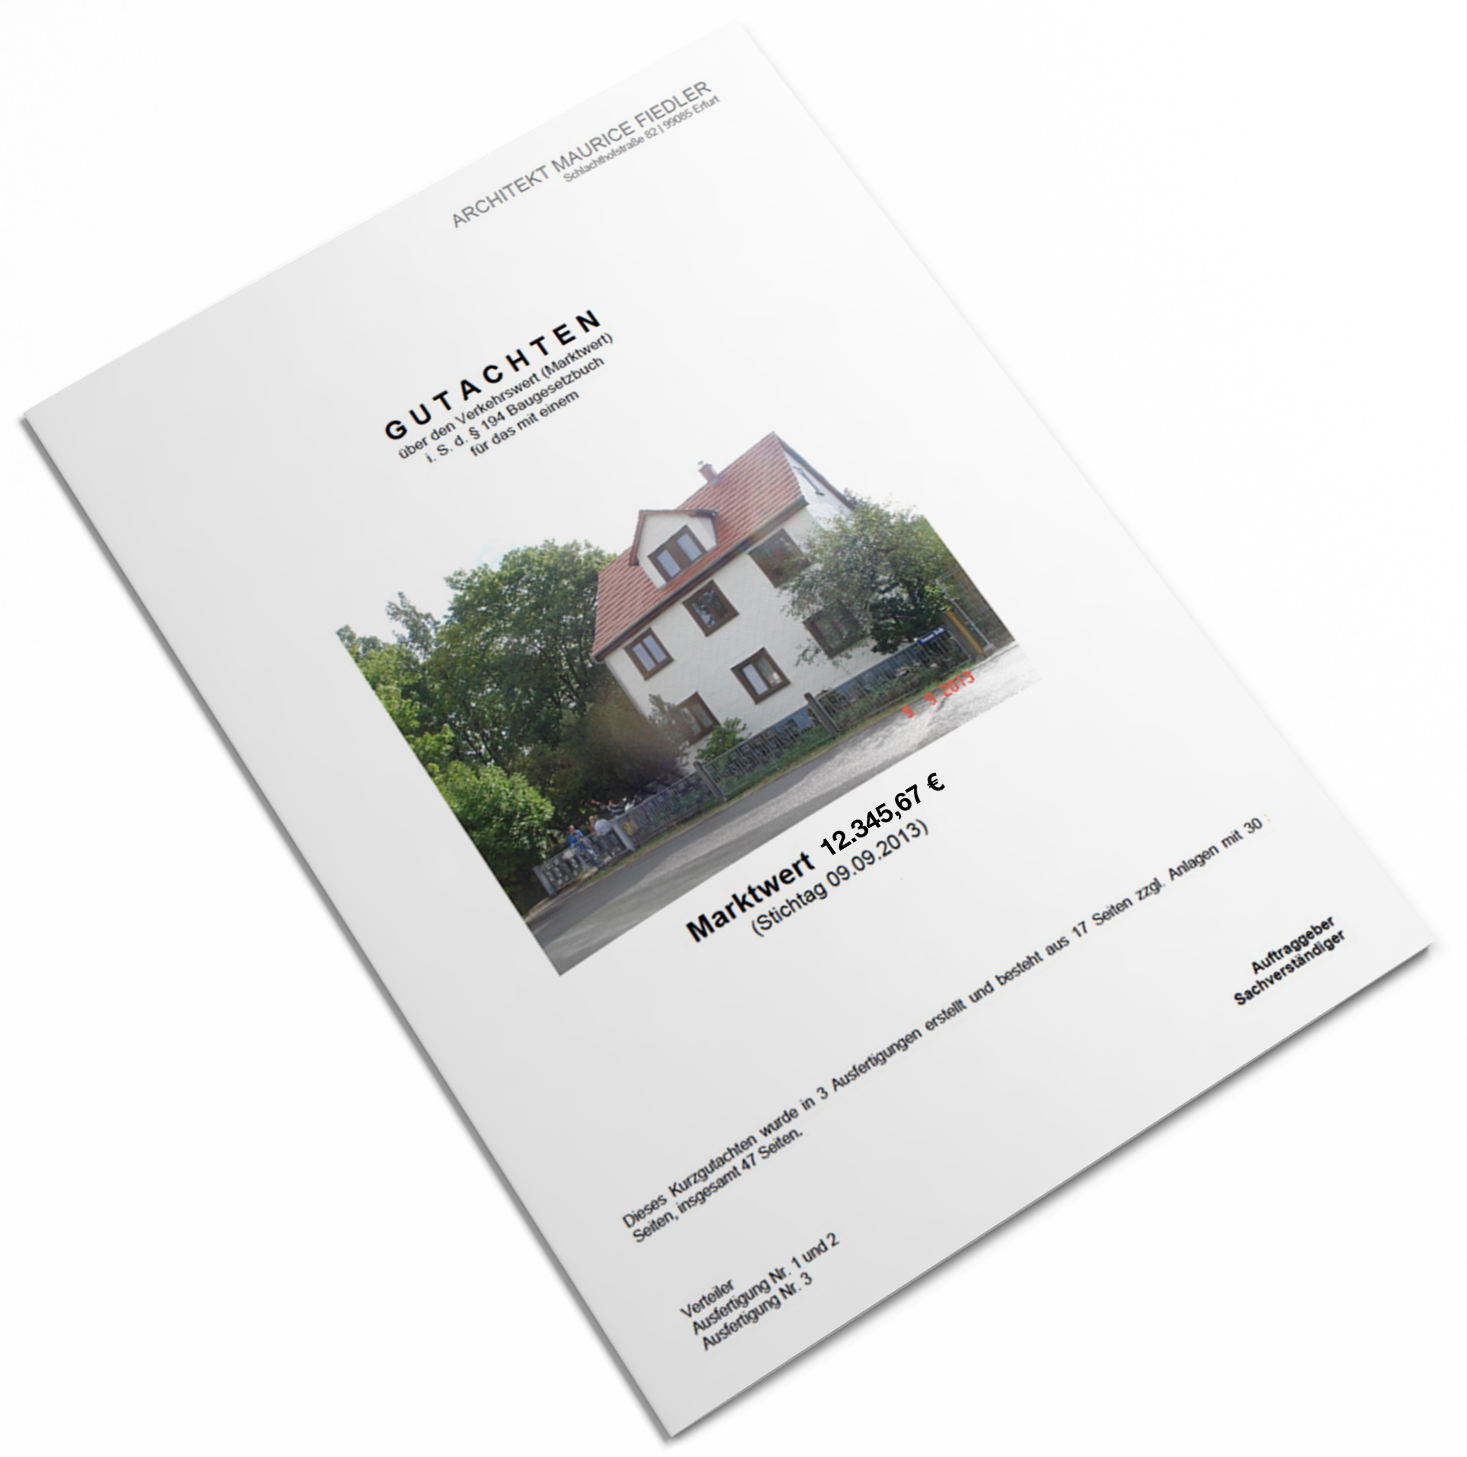 Immobilienbewertung - Verkehrswertgutachten bebaute/unbebaute Grundstücke